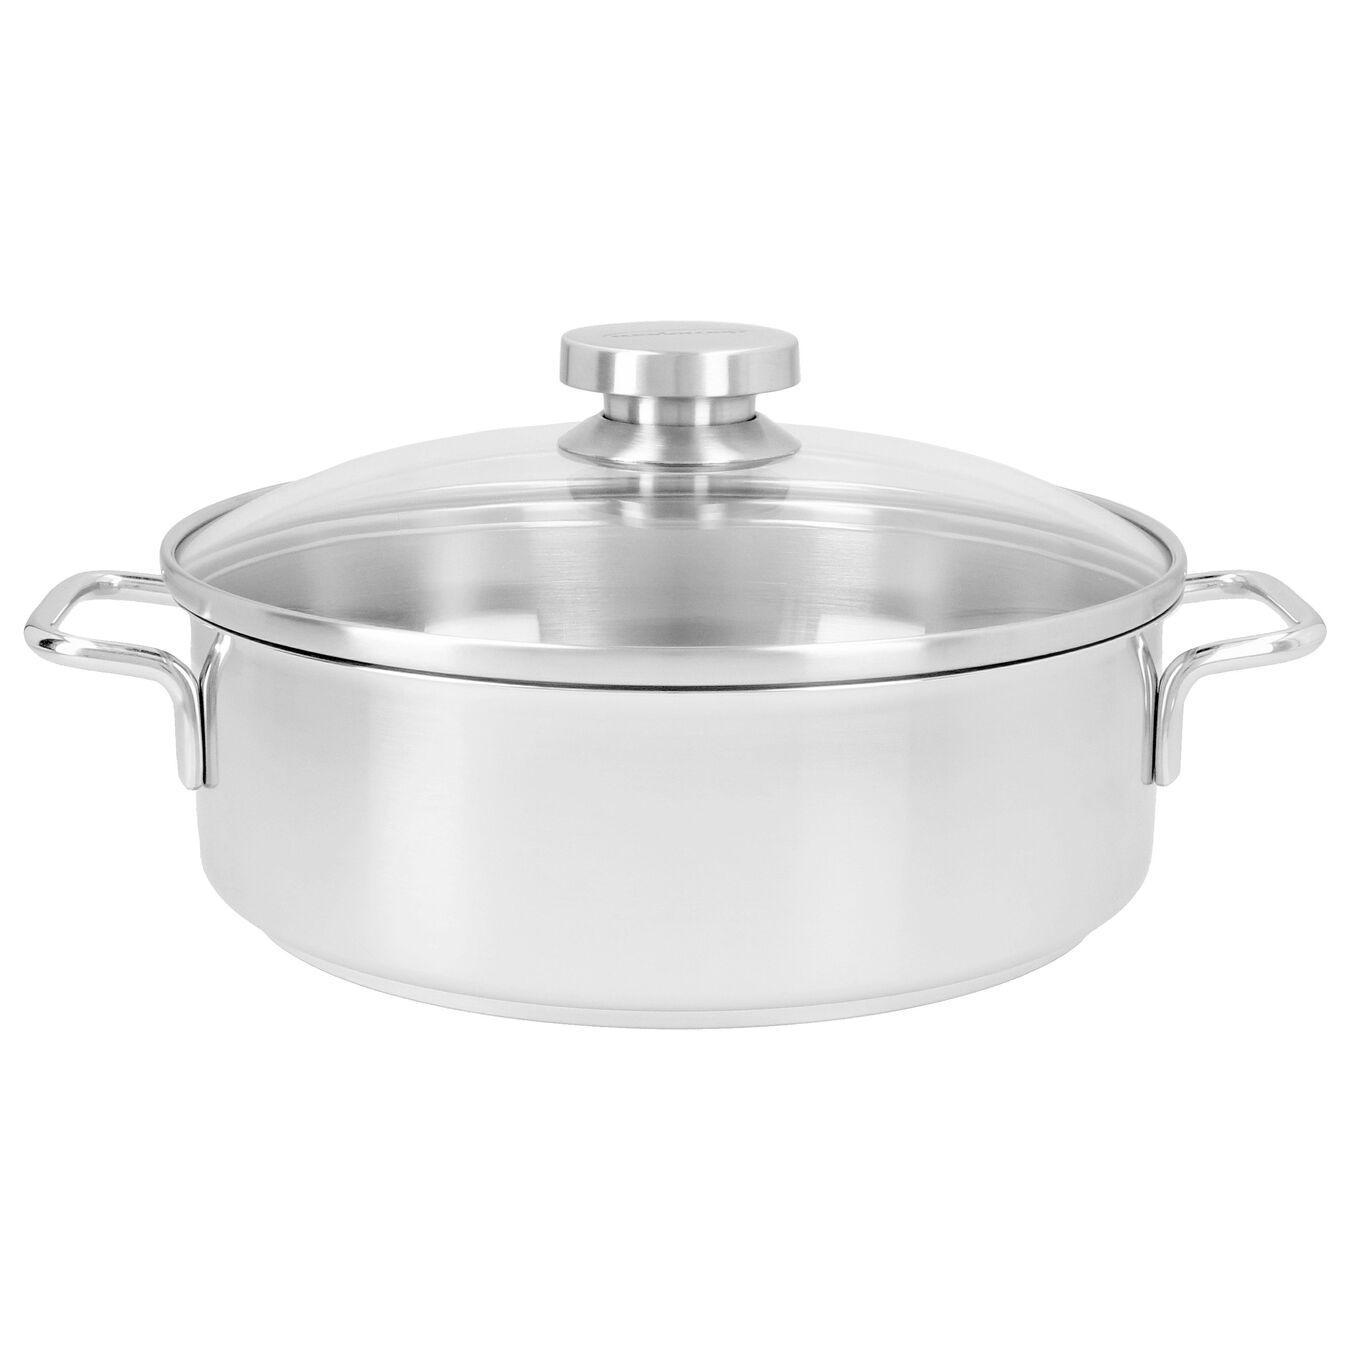 Kookpot met glazen deksel 24 cm / 2,8 l,,large 1